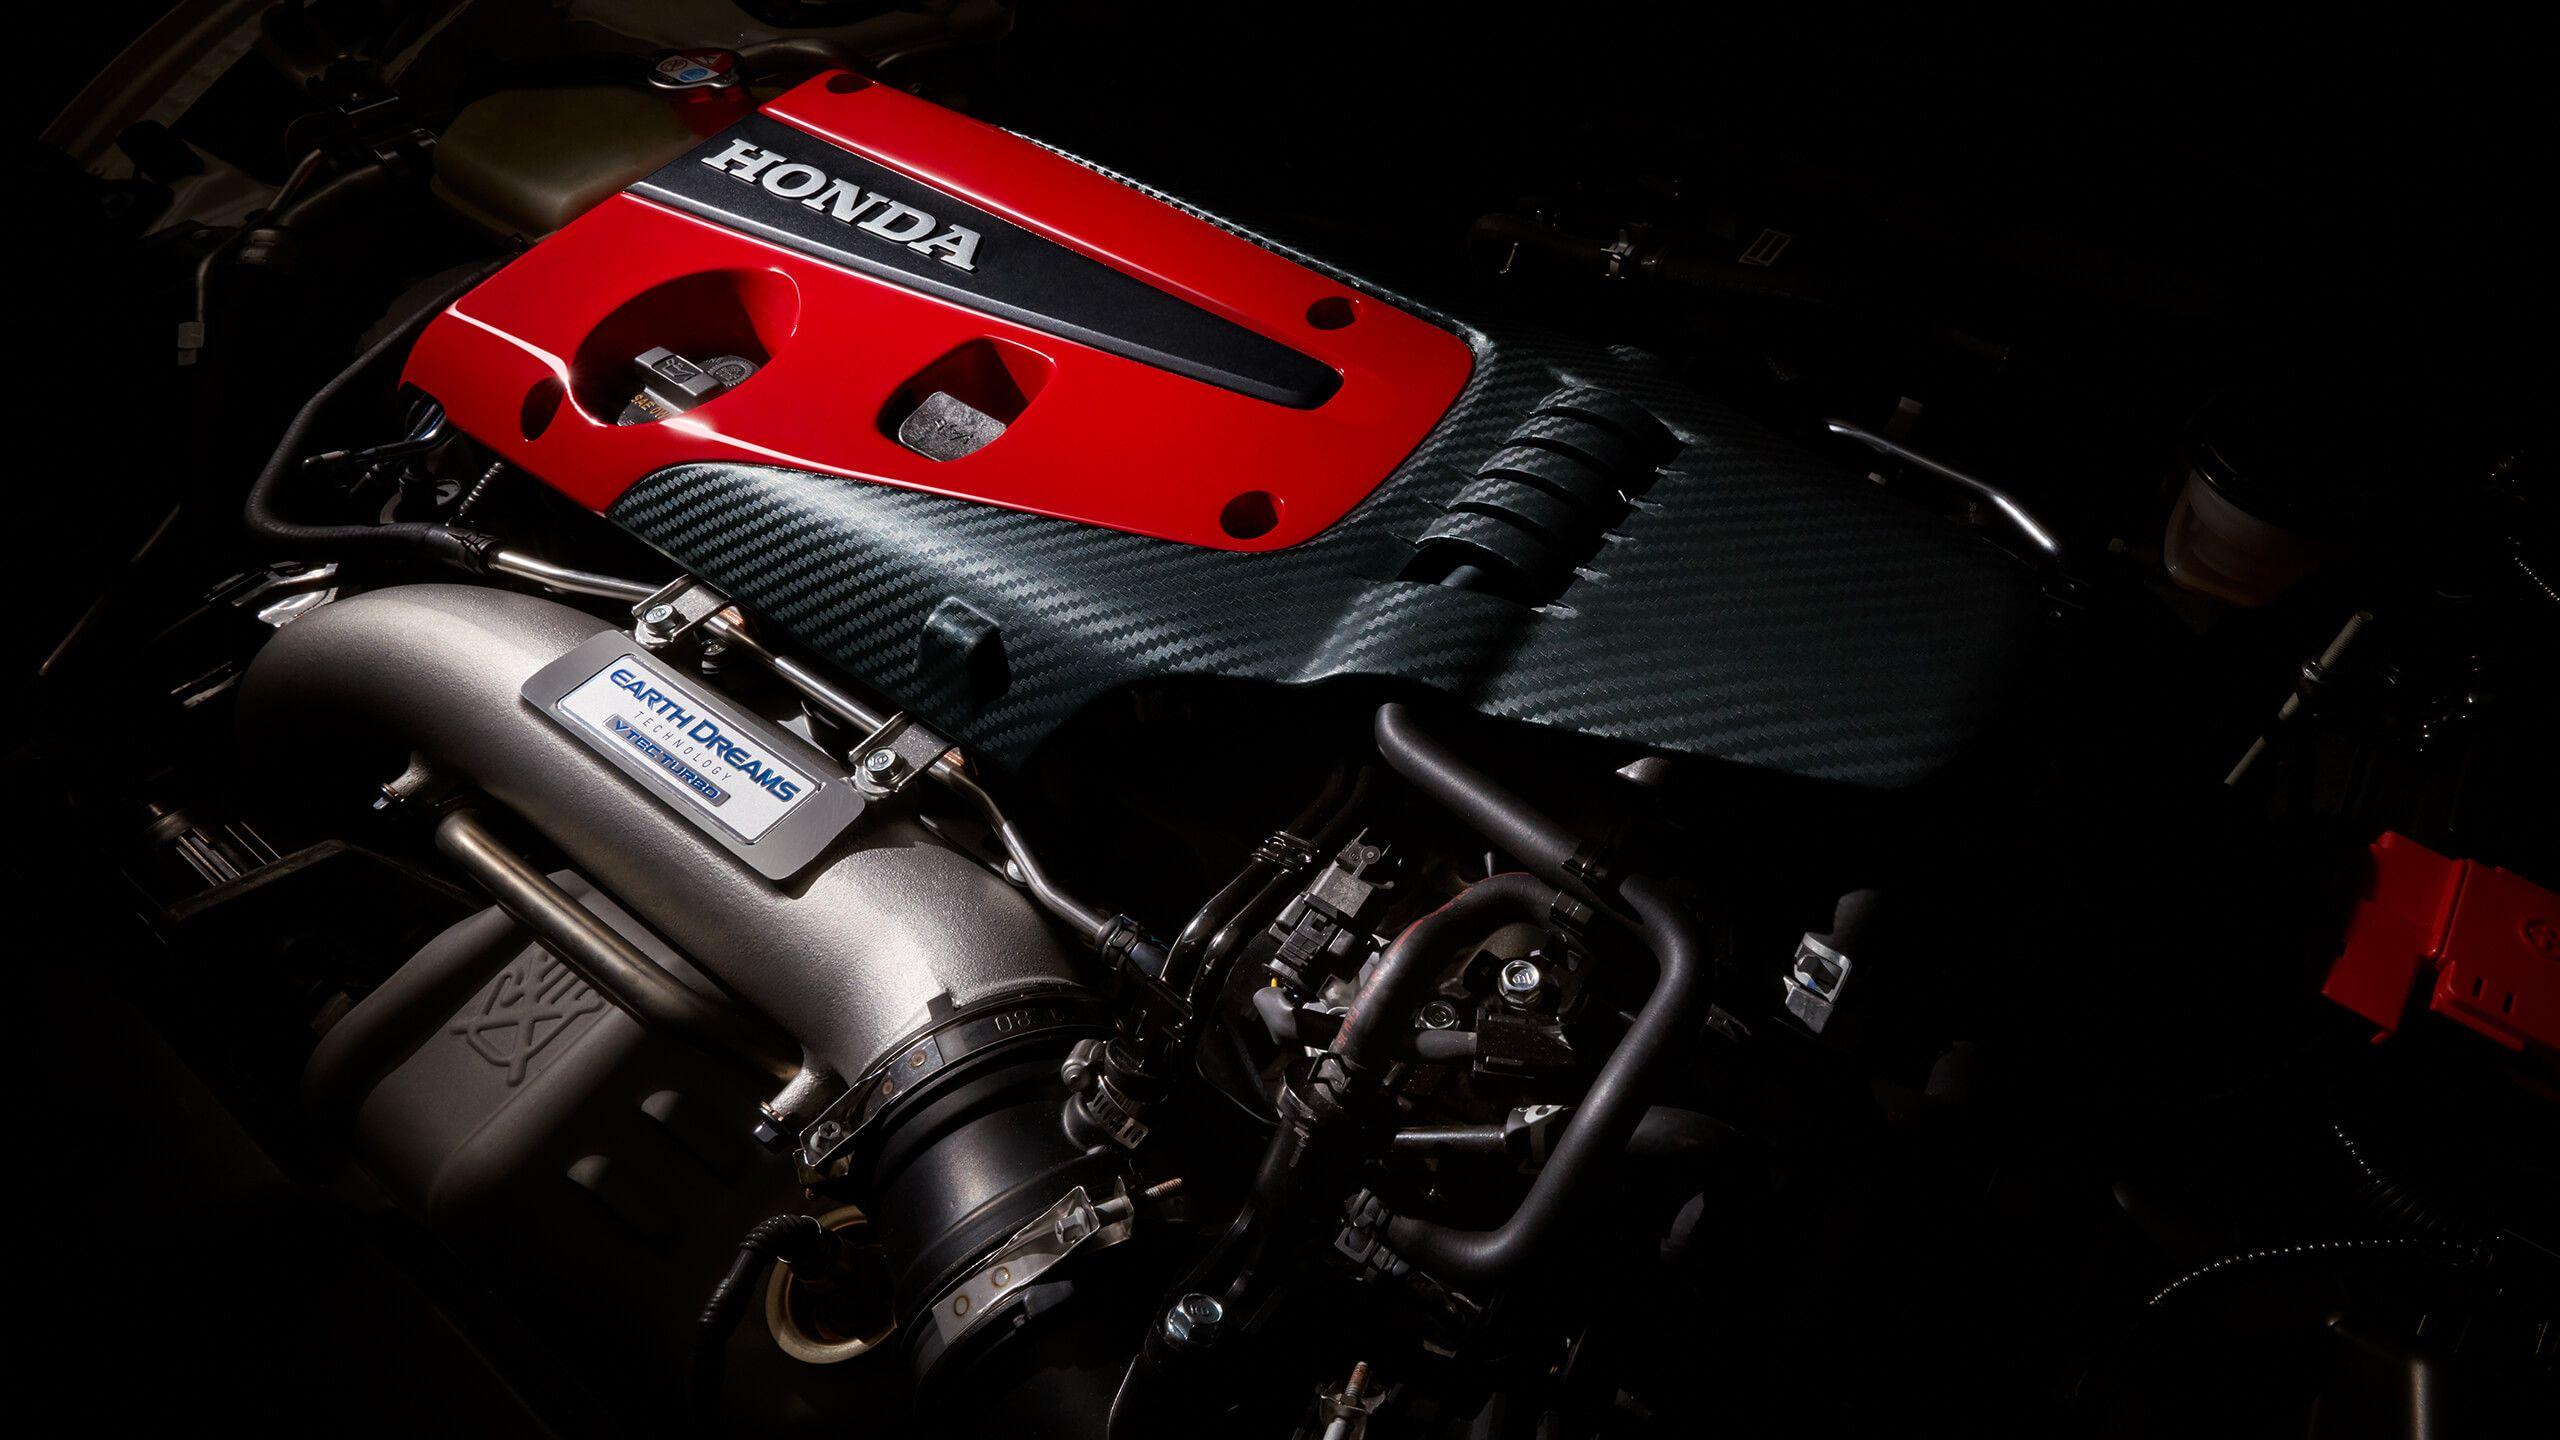 Vehicles Honda Civic Type R Honda Engine Hd Wallpaper Background Image In 2020 Honda Civic Type R Vtec Honda Civic